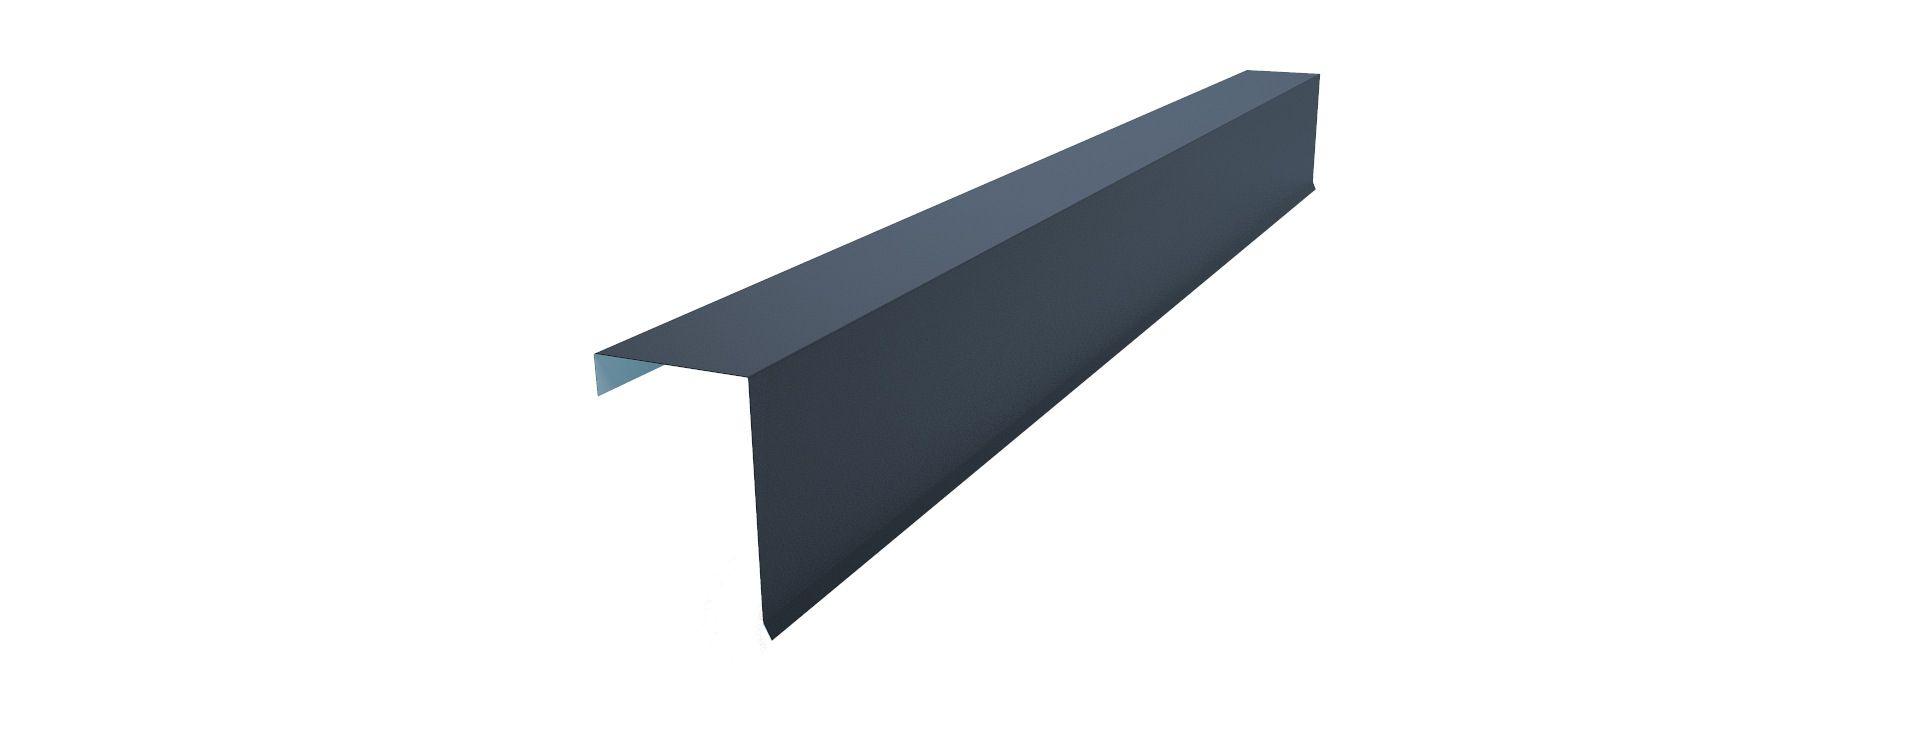 Mono-pitched ridge